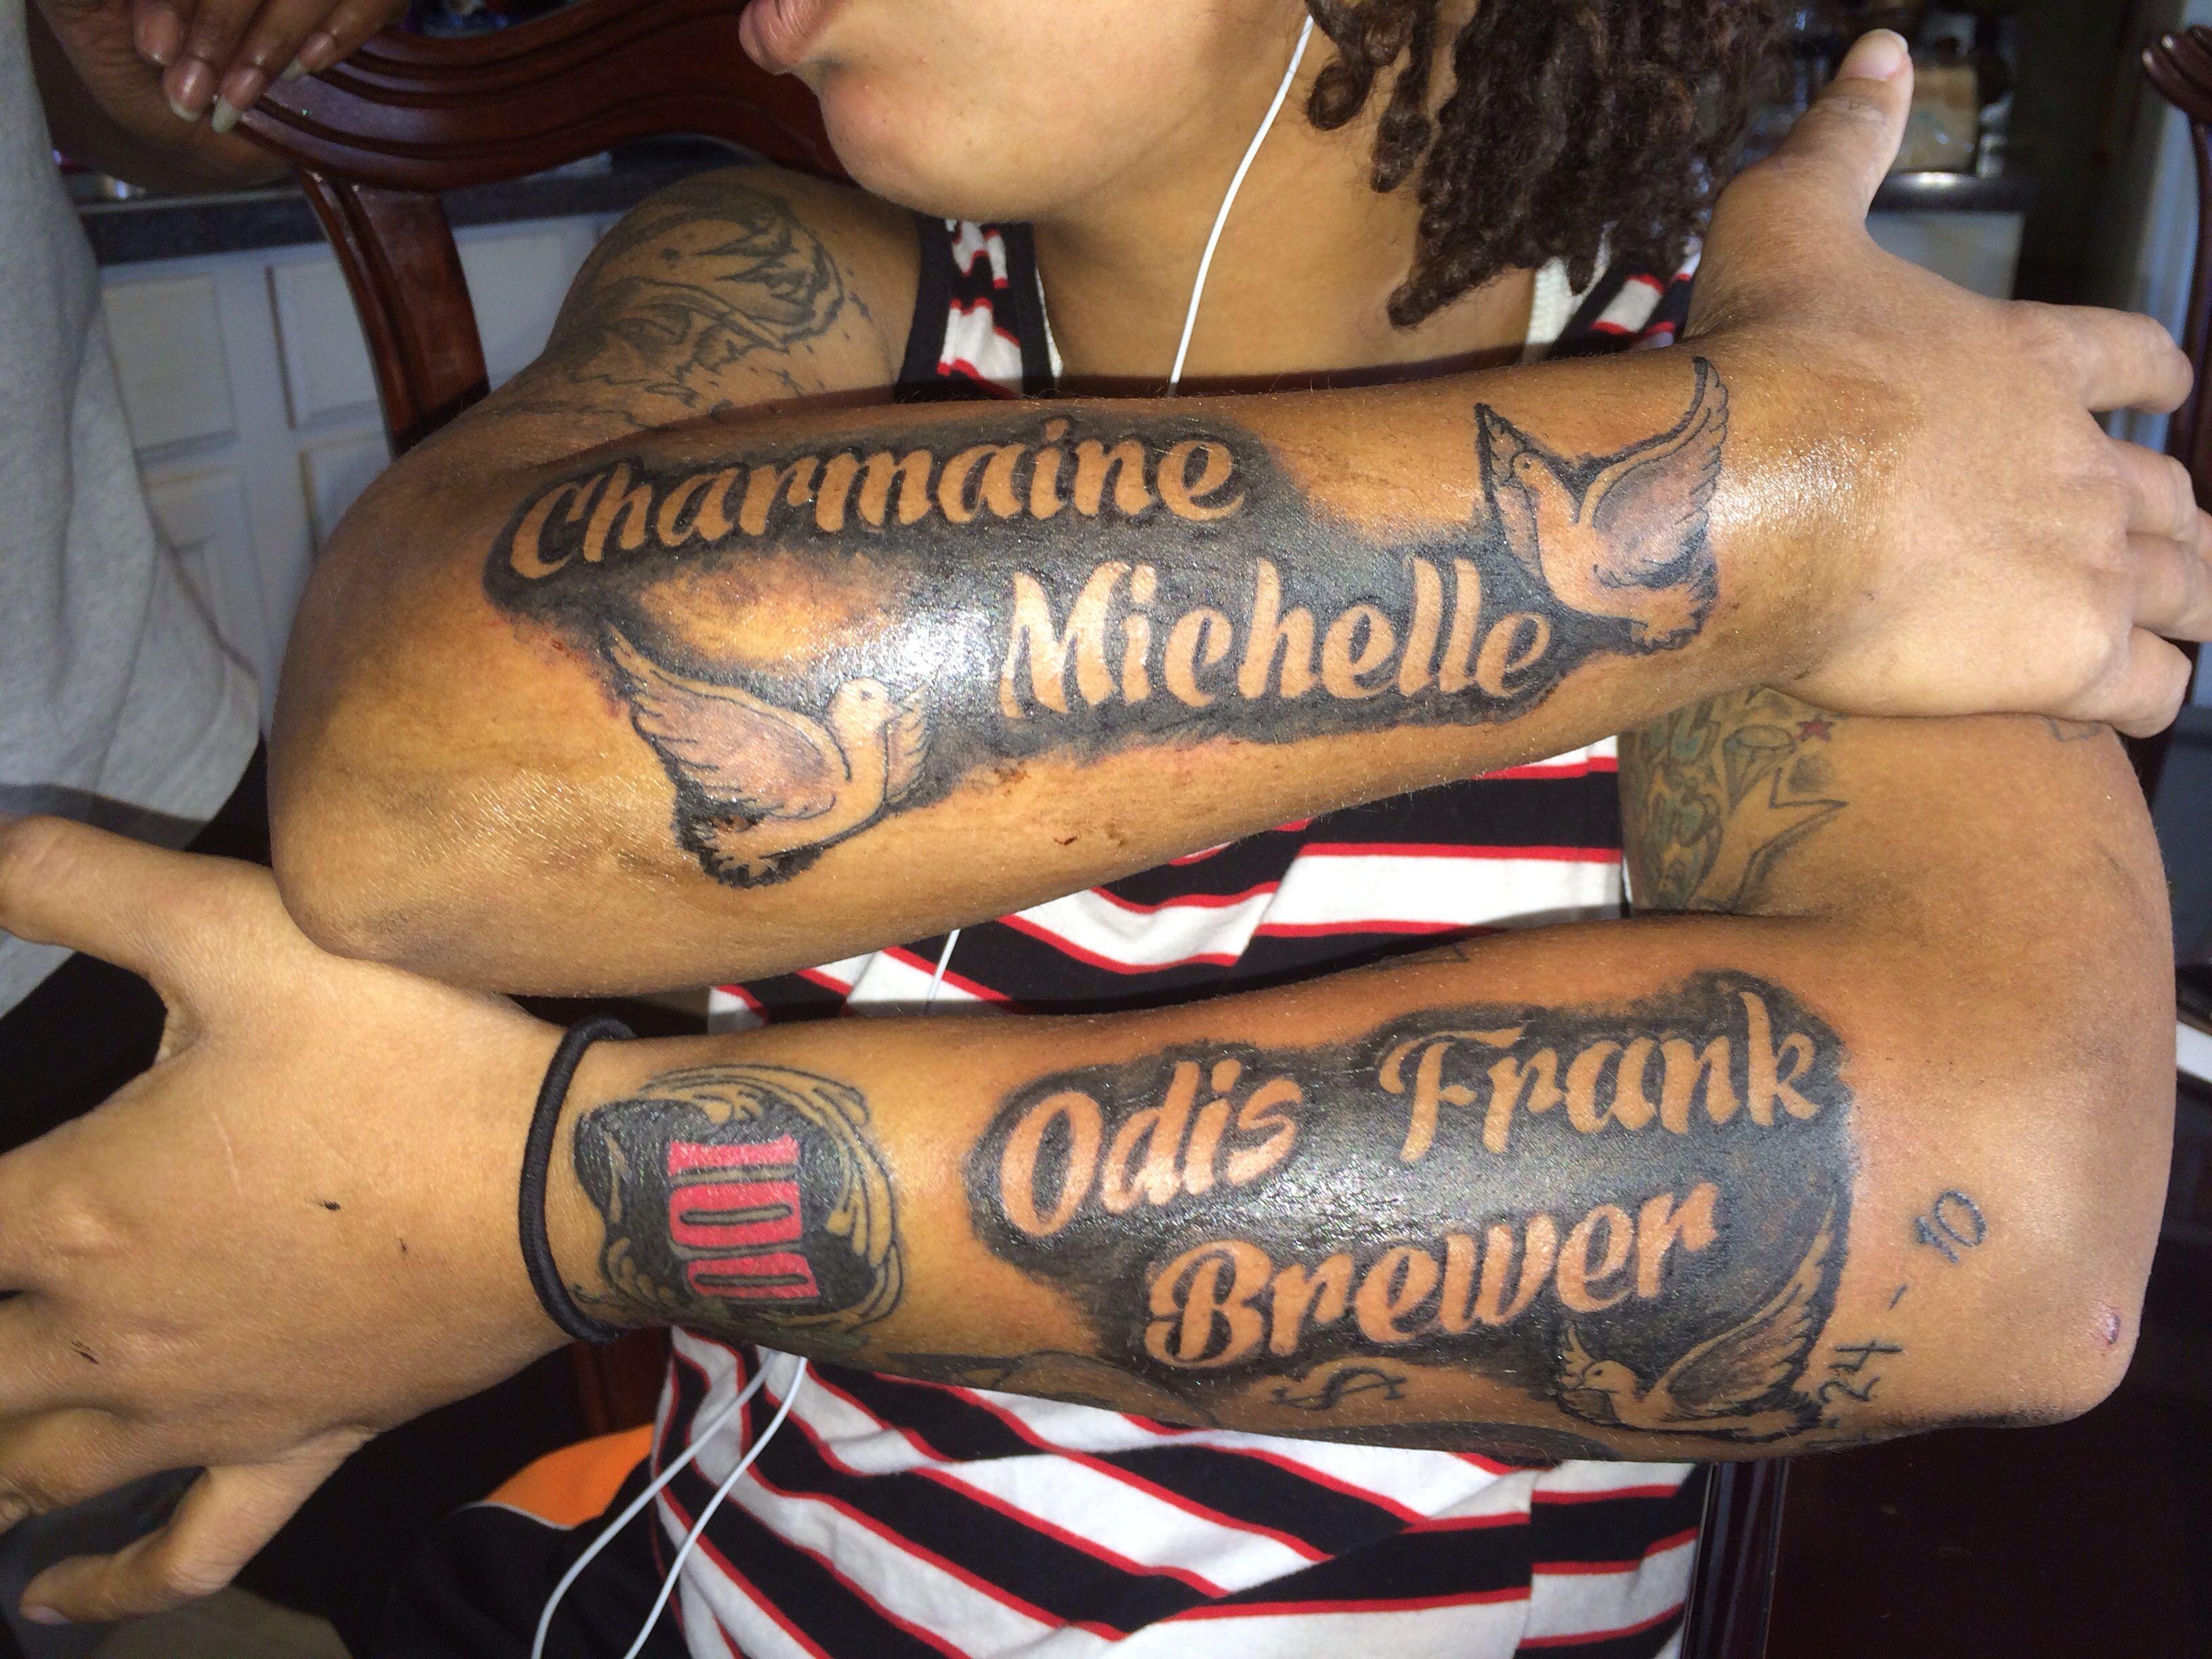 Reverse shading/inverted tattoo | My tatts | Pinterest ...